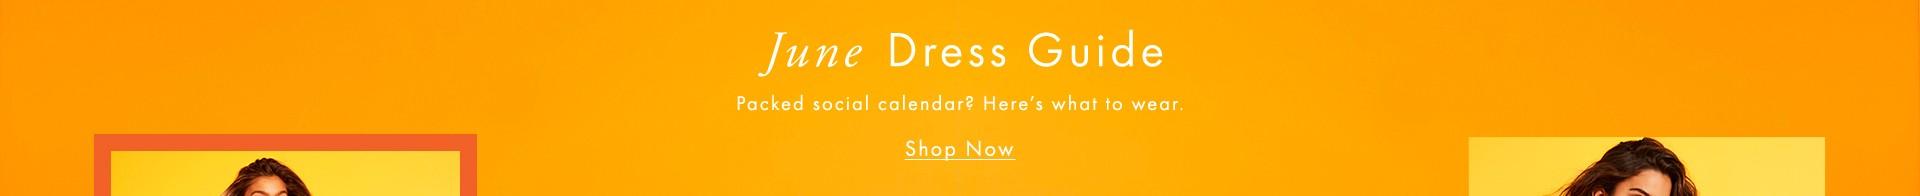 June Dress Guide